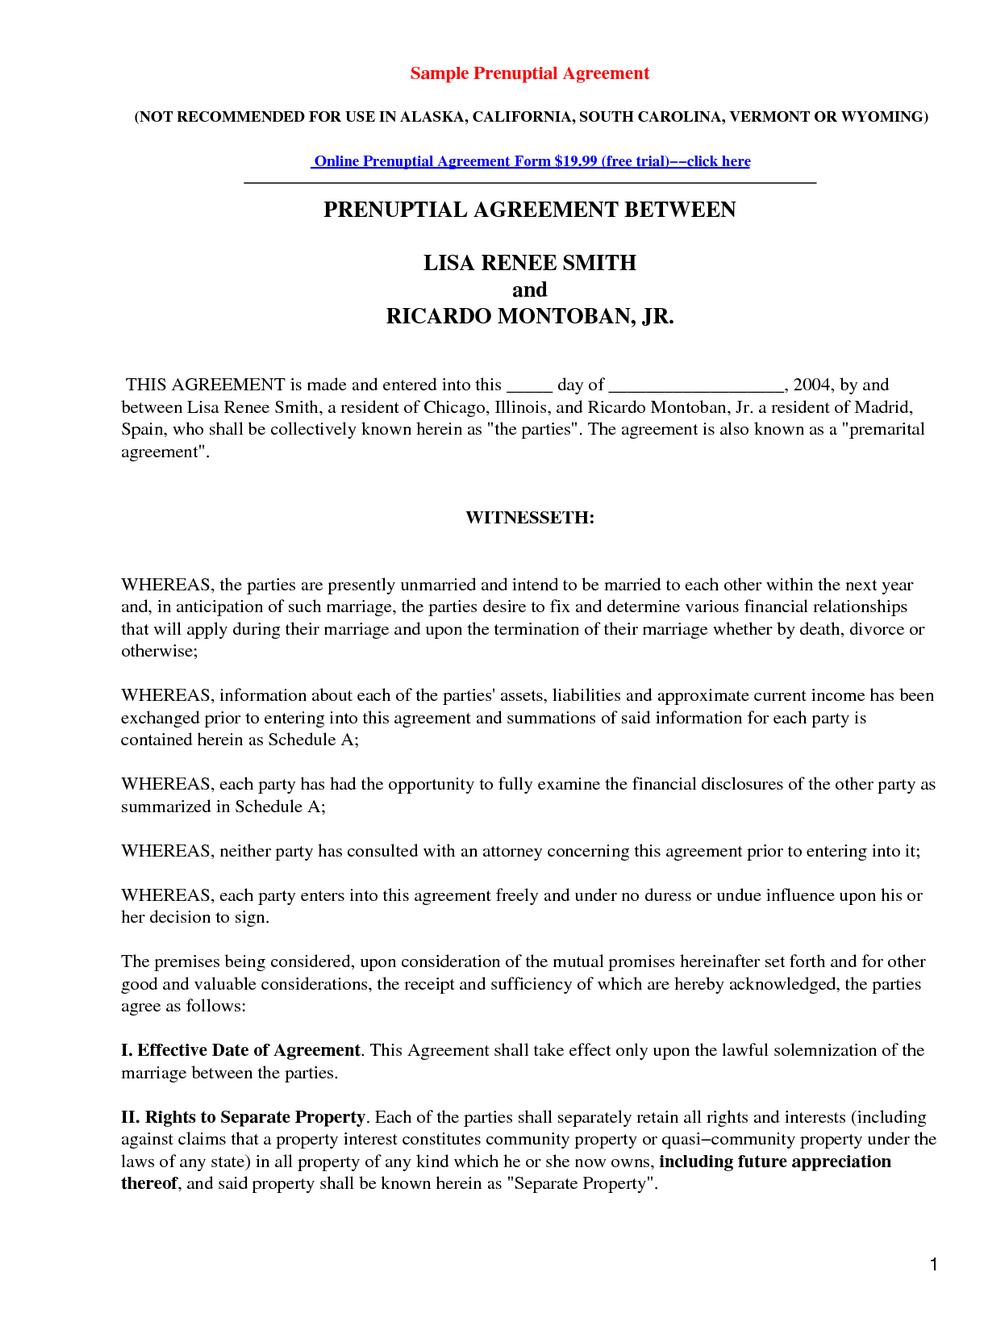 Prenuptial Agreement Form In Spanish